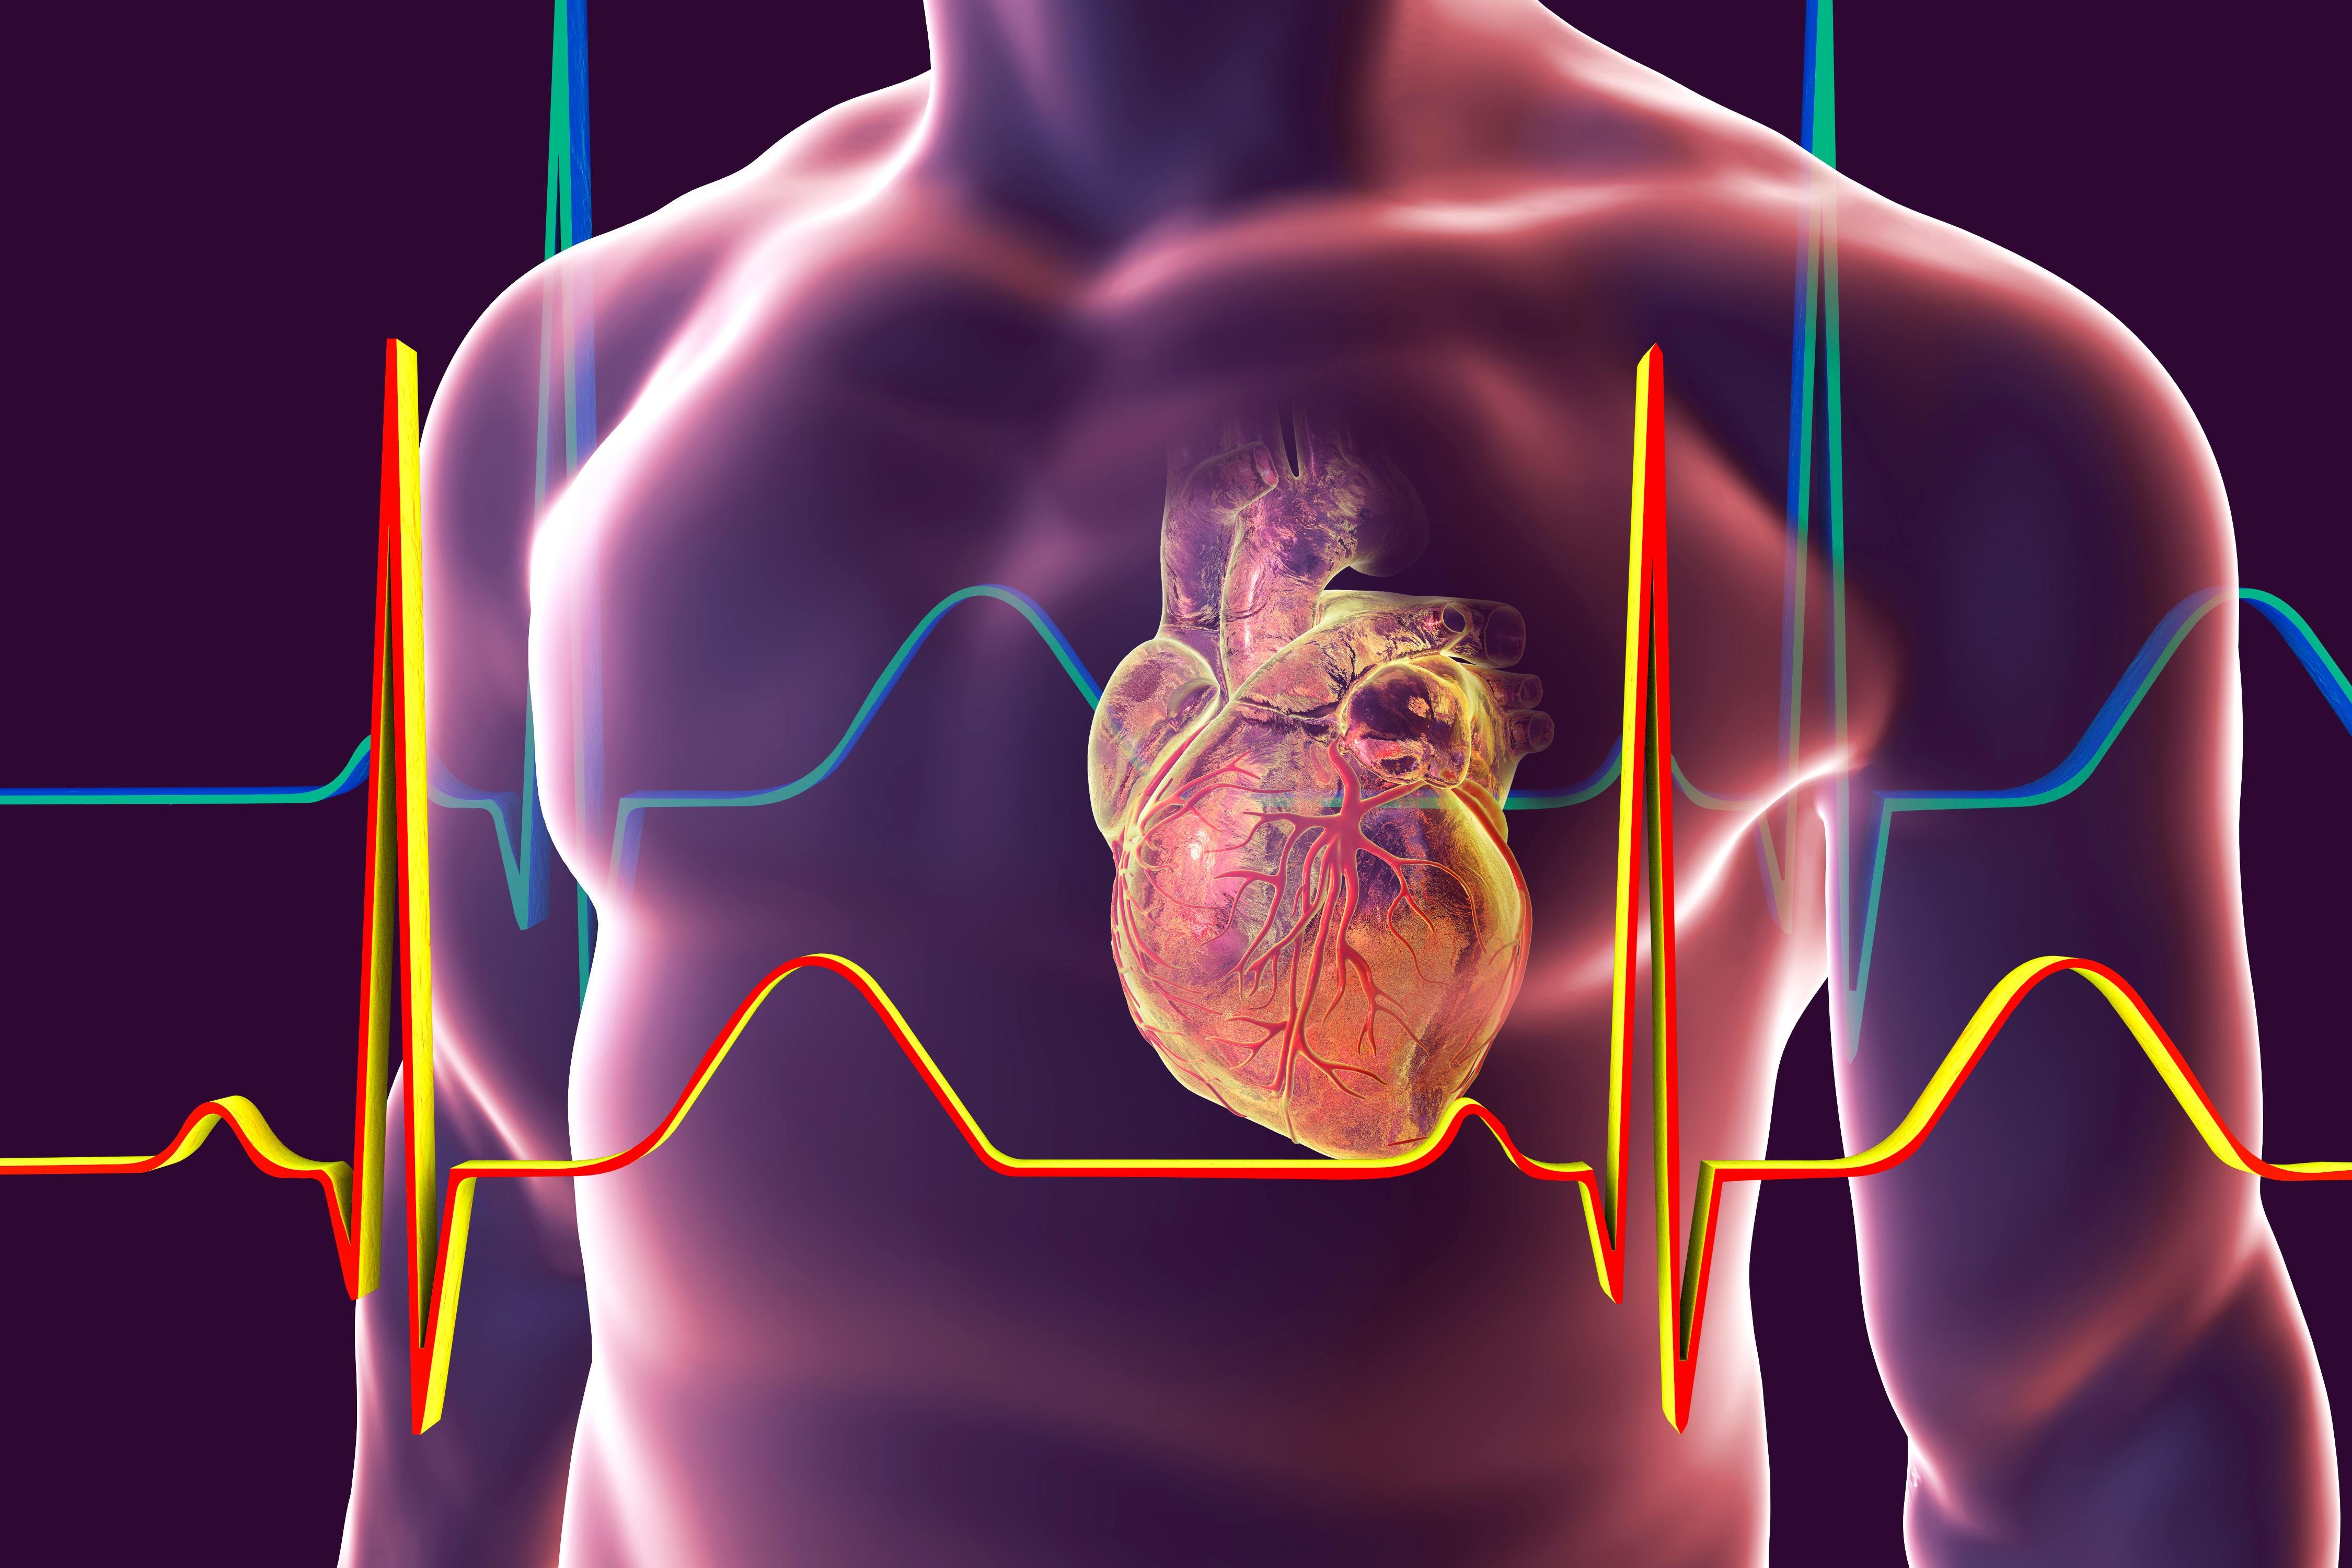 ADA 2018, ZDSD rat cardiac function studies, cardiac dysfunction rodent model